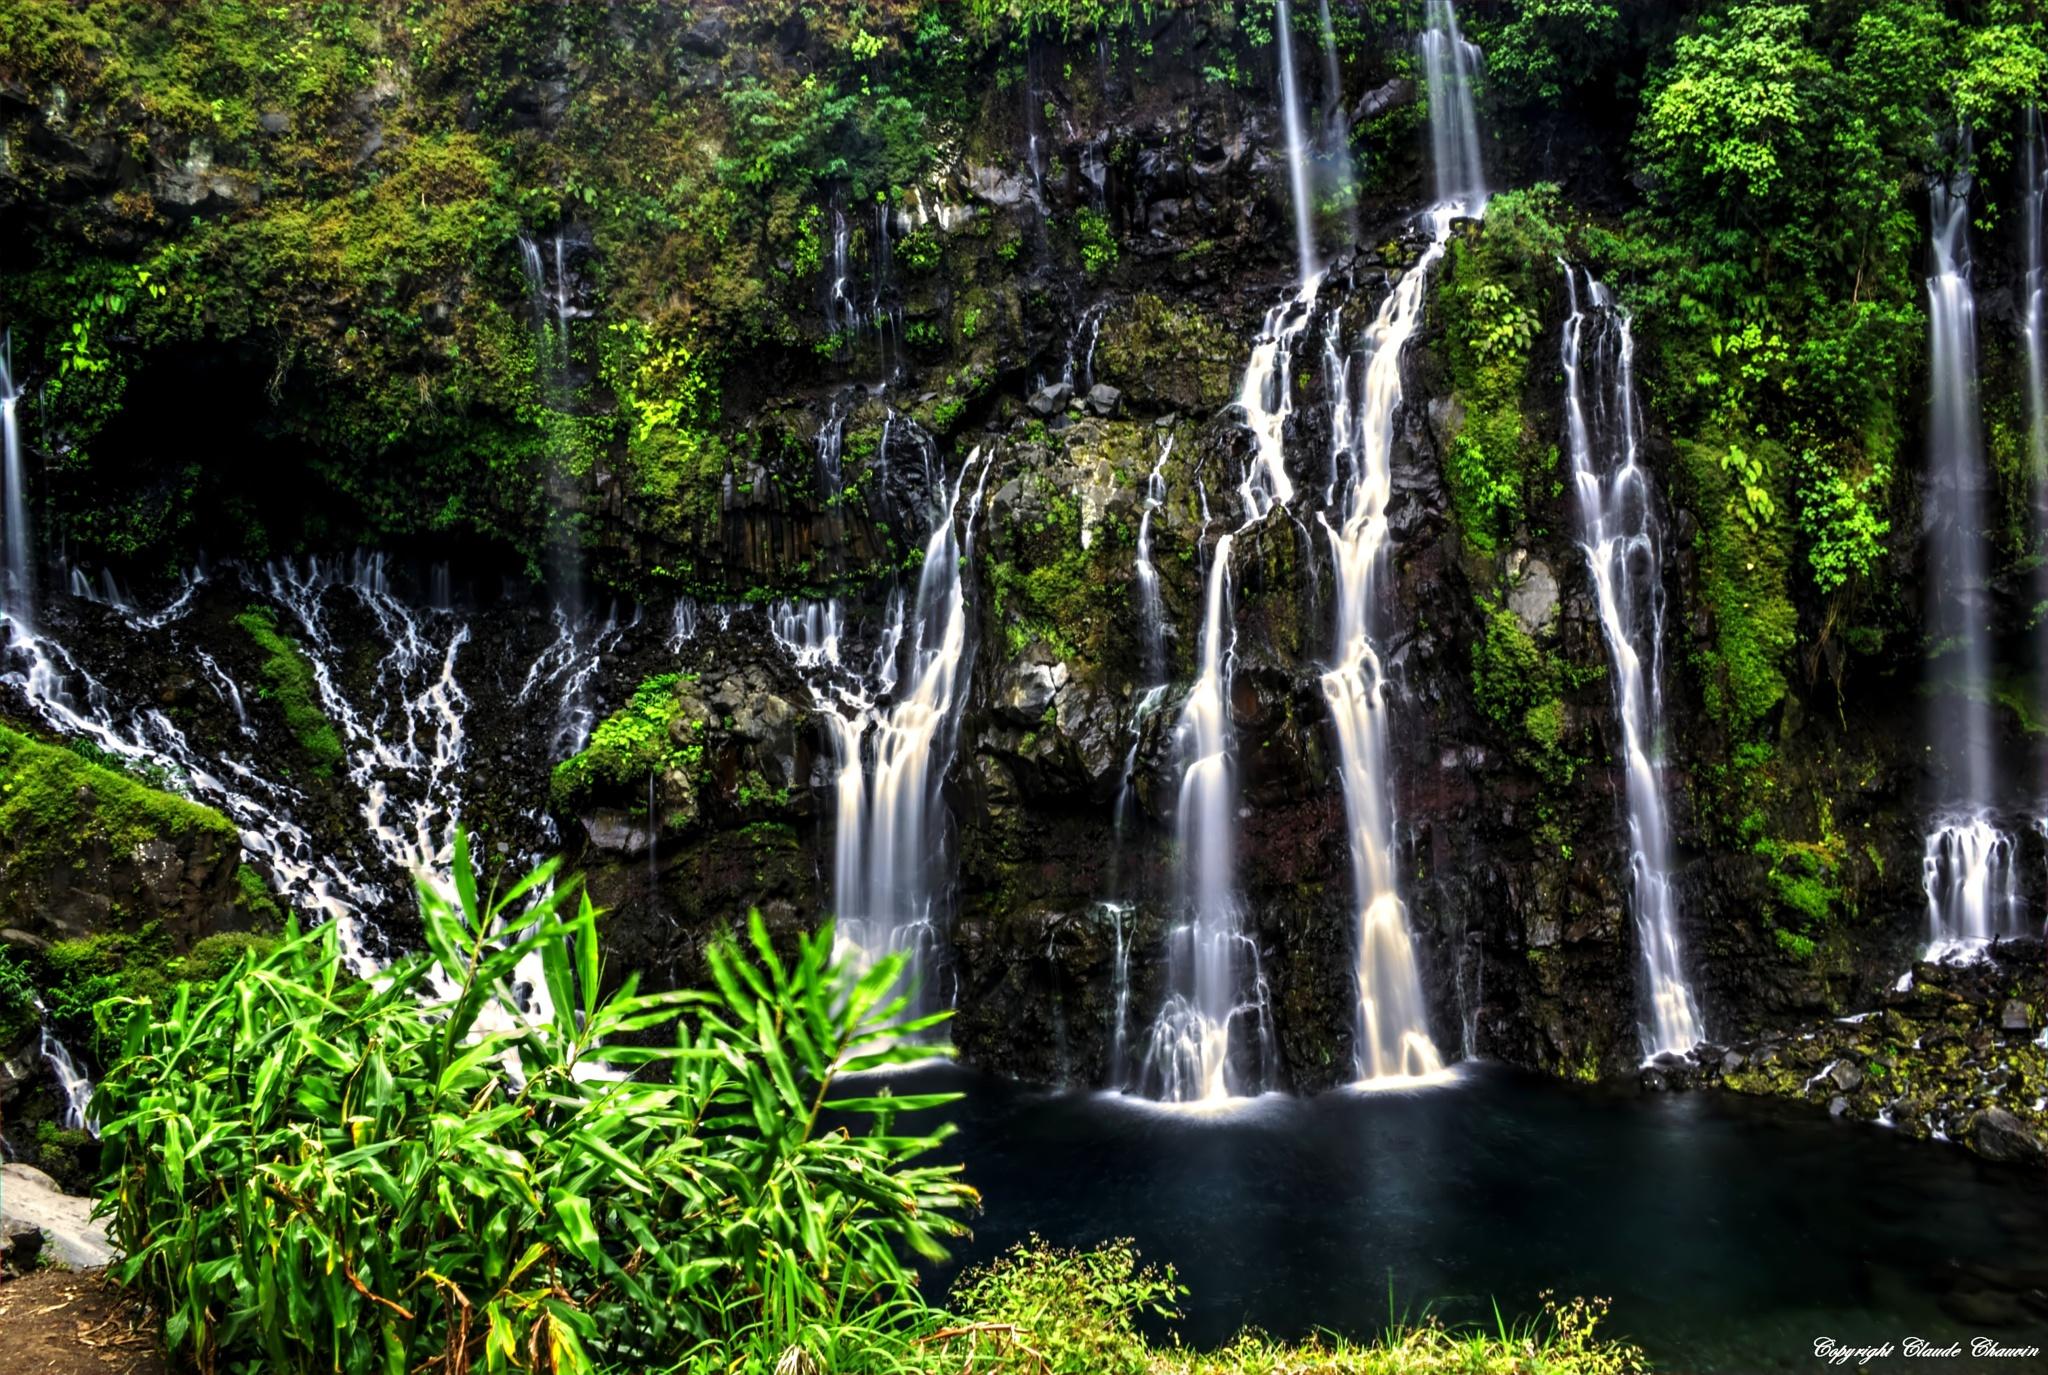 Langevin Waterfall II by claudechauvin67